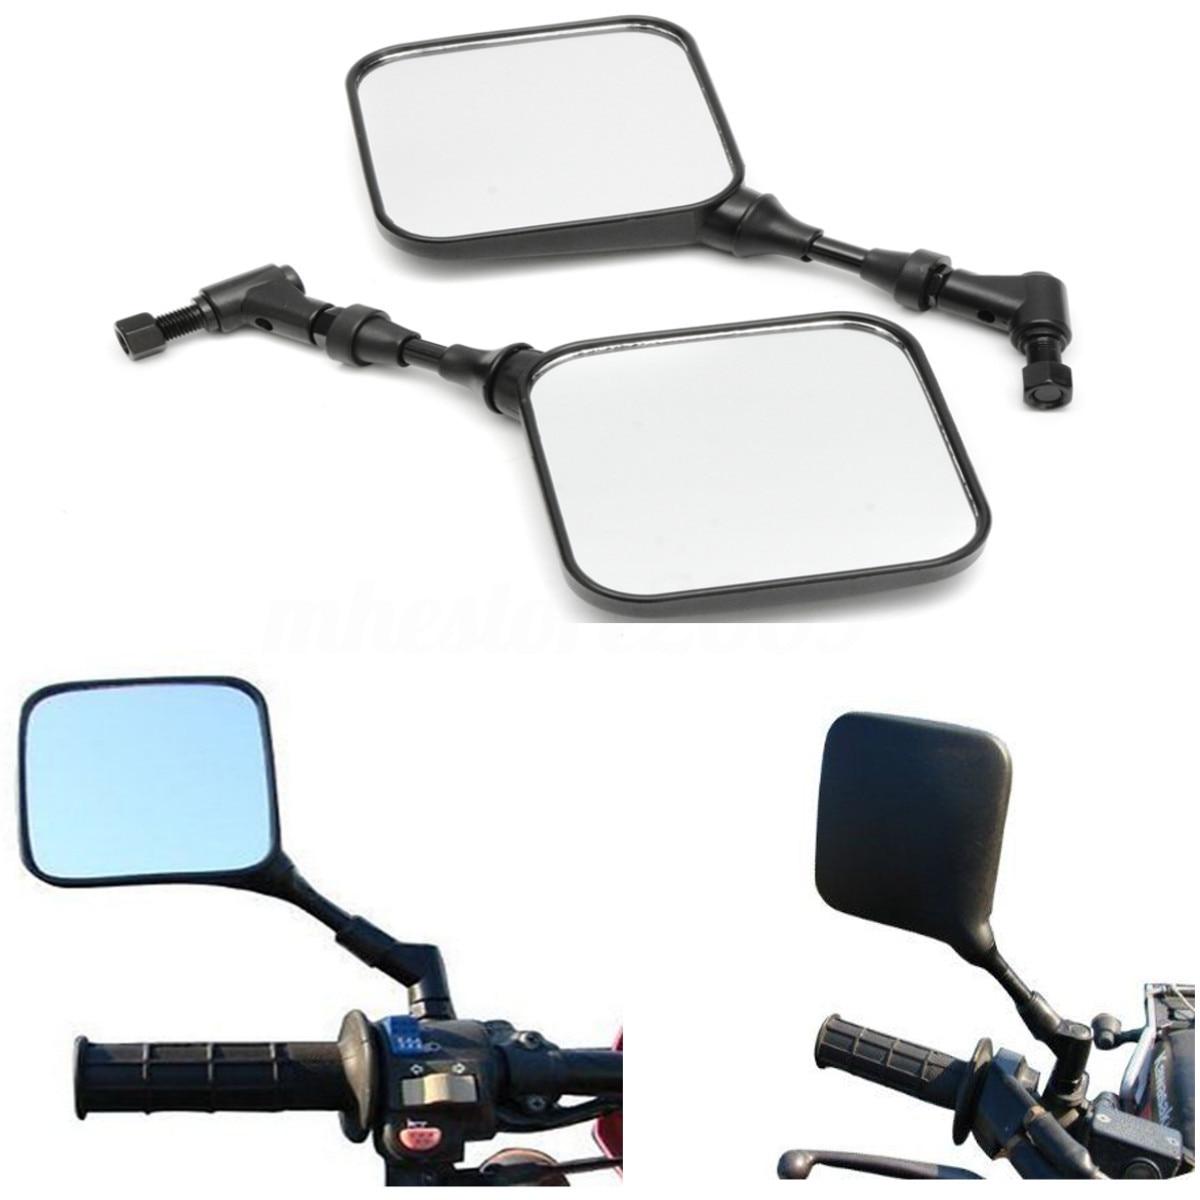 Negro retrovisor para motocicleta espejos Durable portátil ajuste para todos los ángulos para Suzuki 200 DR 250 DR350 DRZ 400 650 DR650